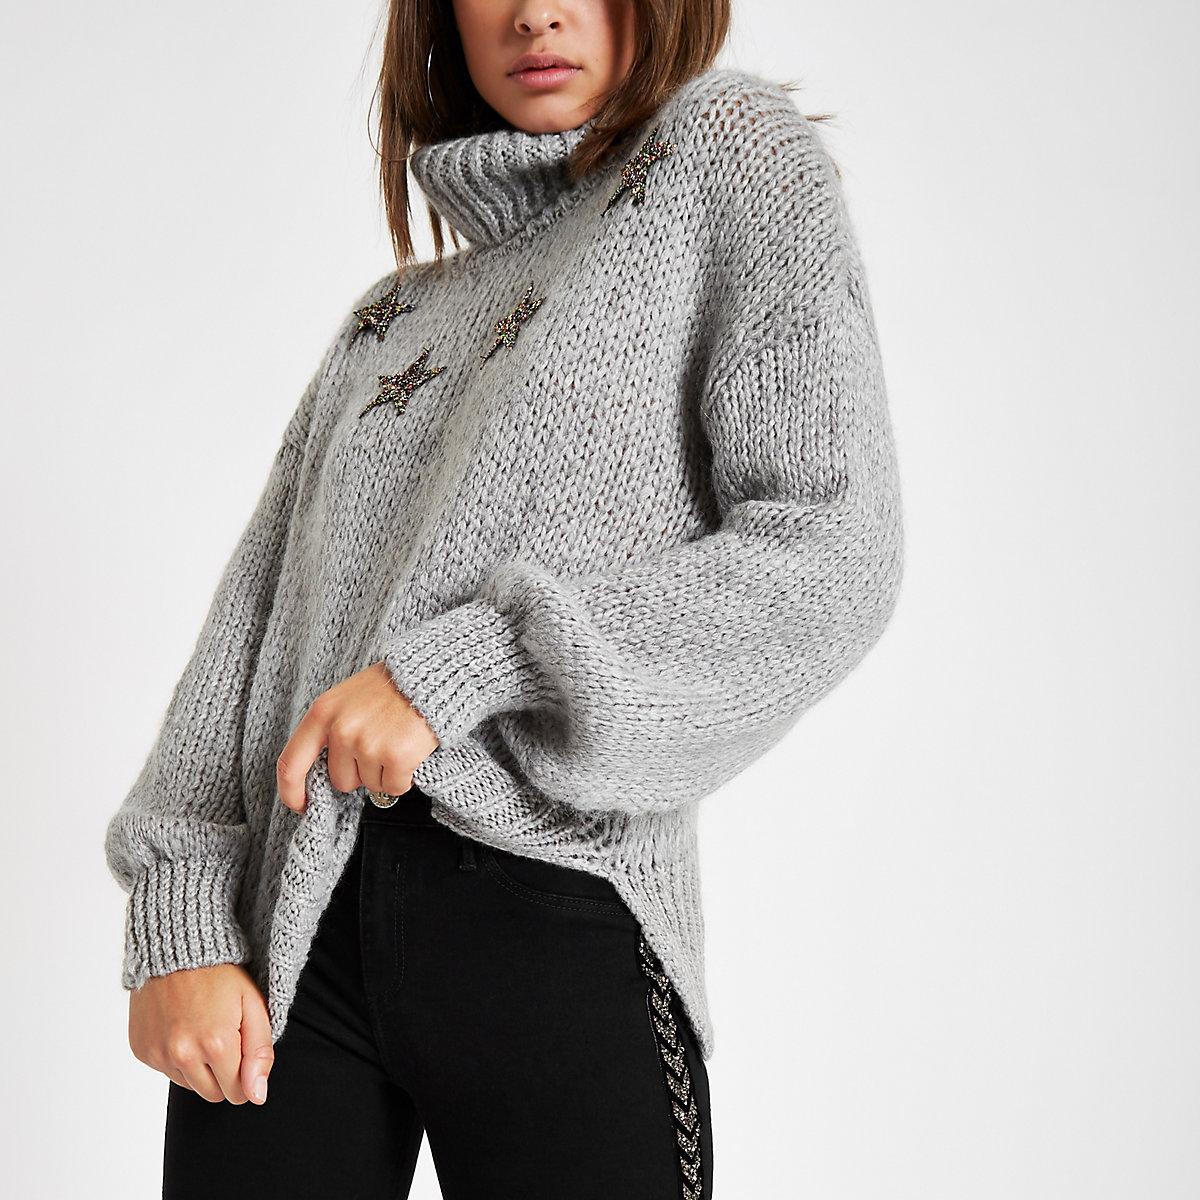 Grey star roll neck knit sweater